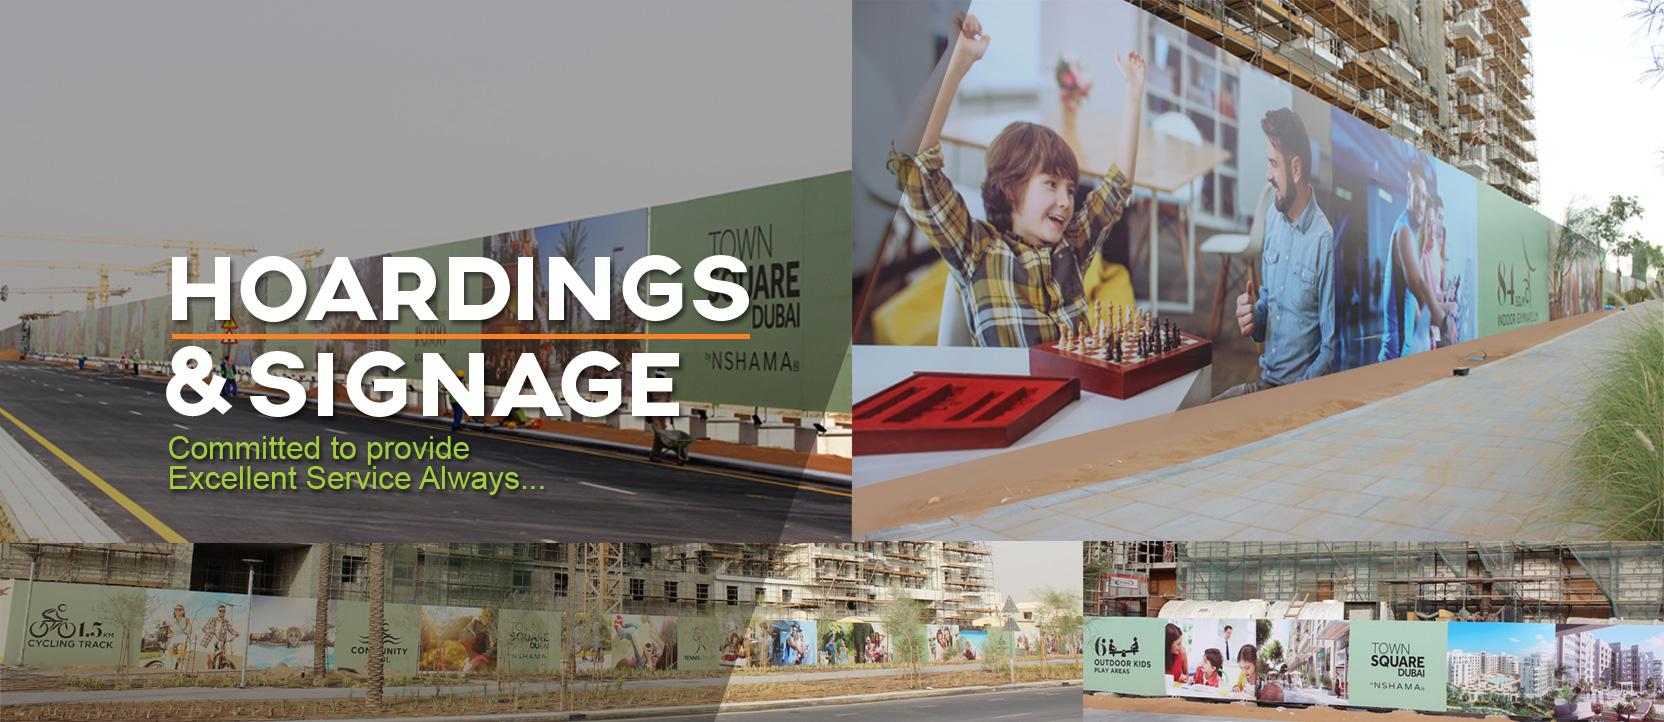 nshama-banner-fence-hoarding-large-format-printing-1